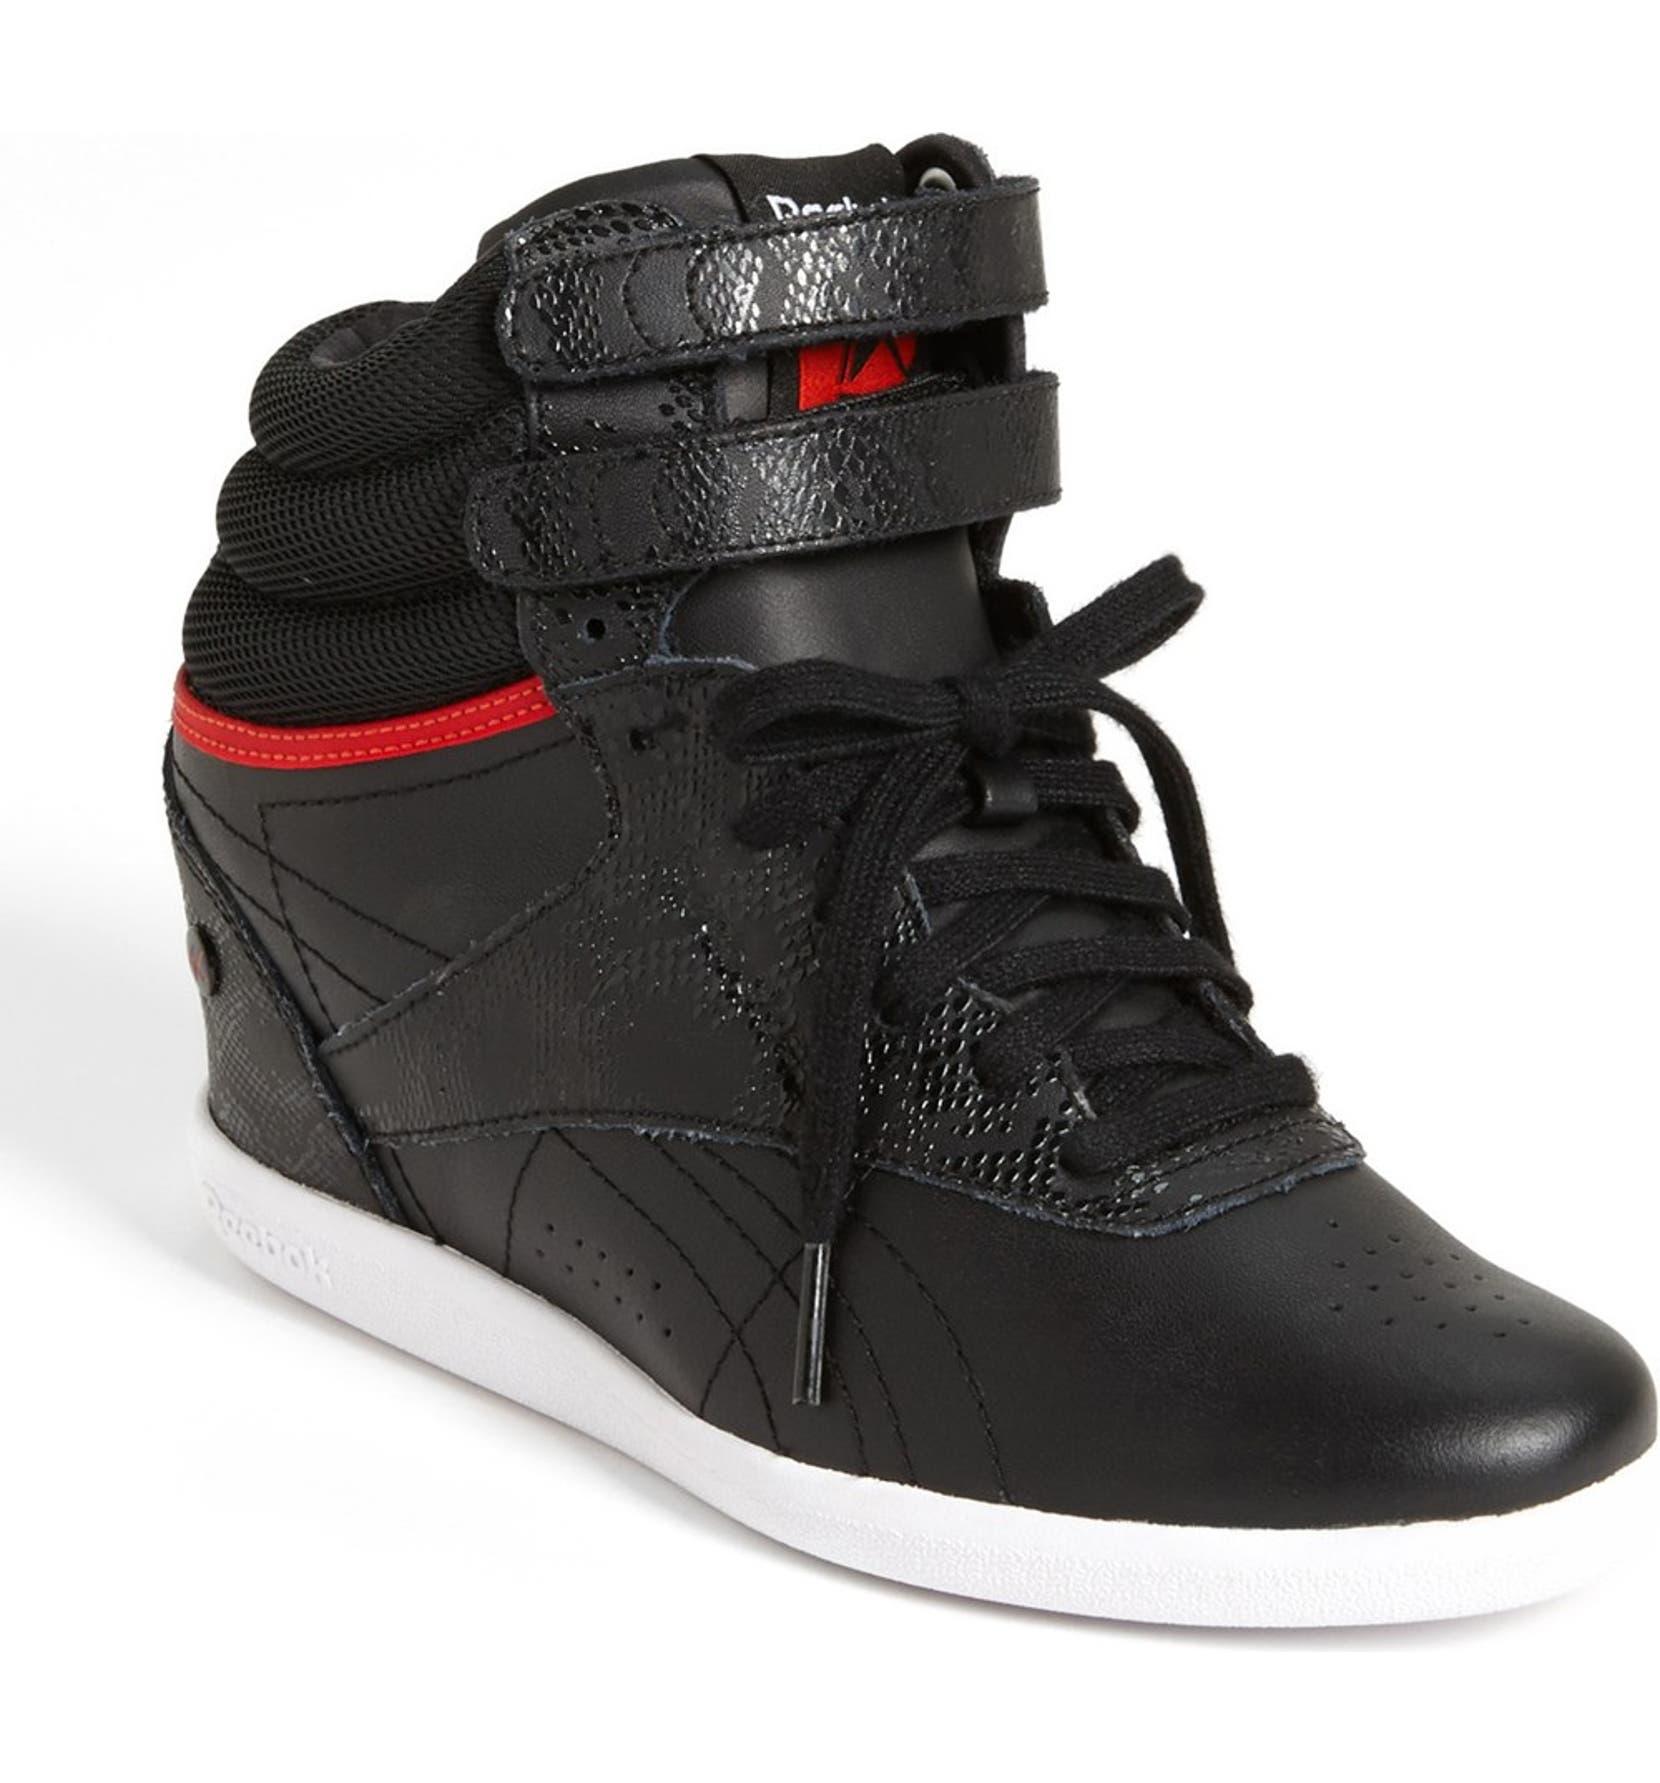 96e2094b6e49a3 Reebok  Freestyle Hi Wedge A. Keys  Sneaker (Women)